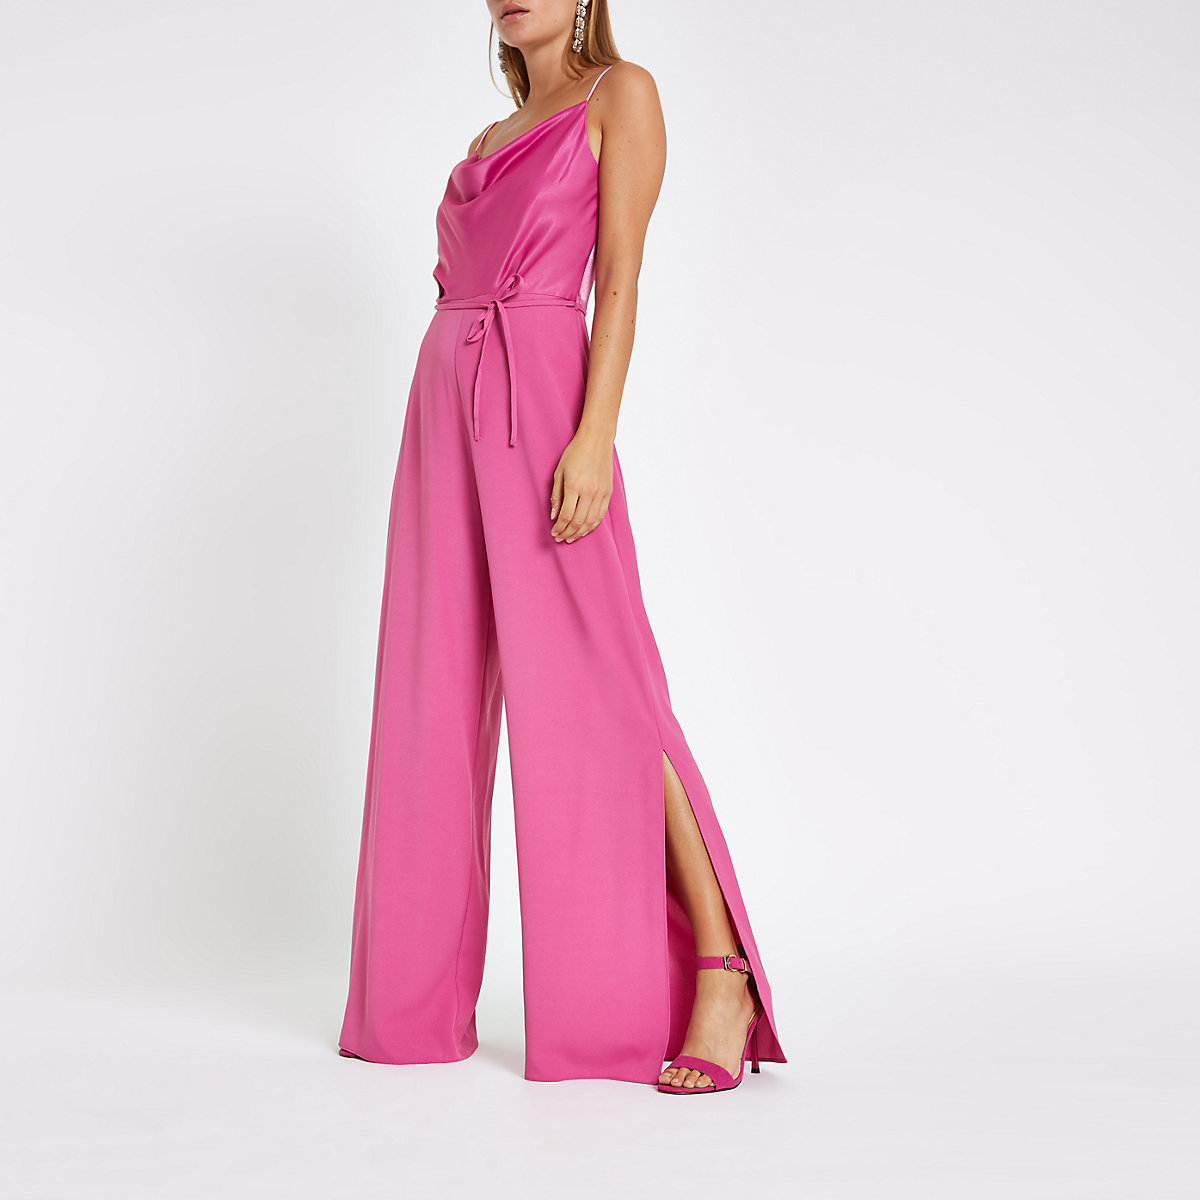 Dark Pink Cowl Neck Cami Strap Jumpsuit Jumpsuits Rompers